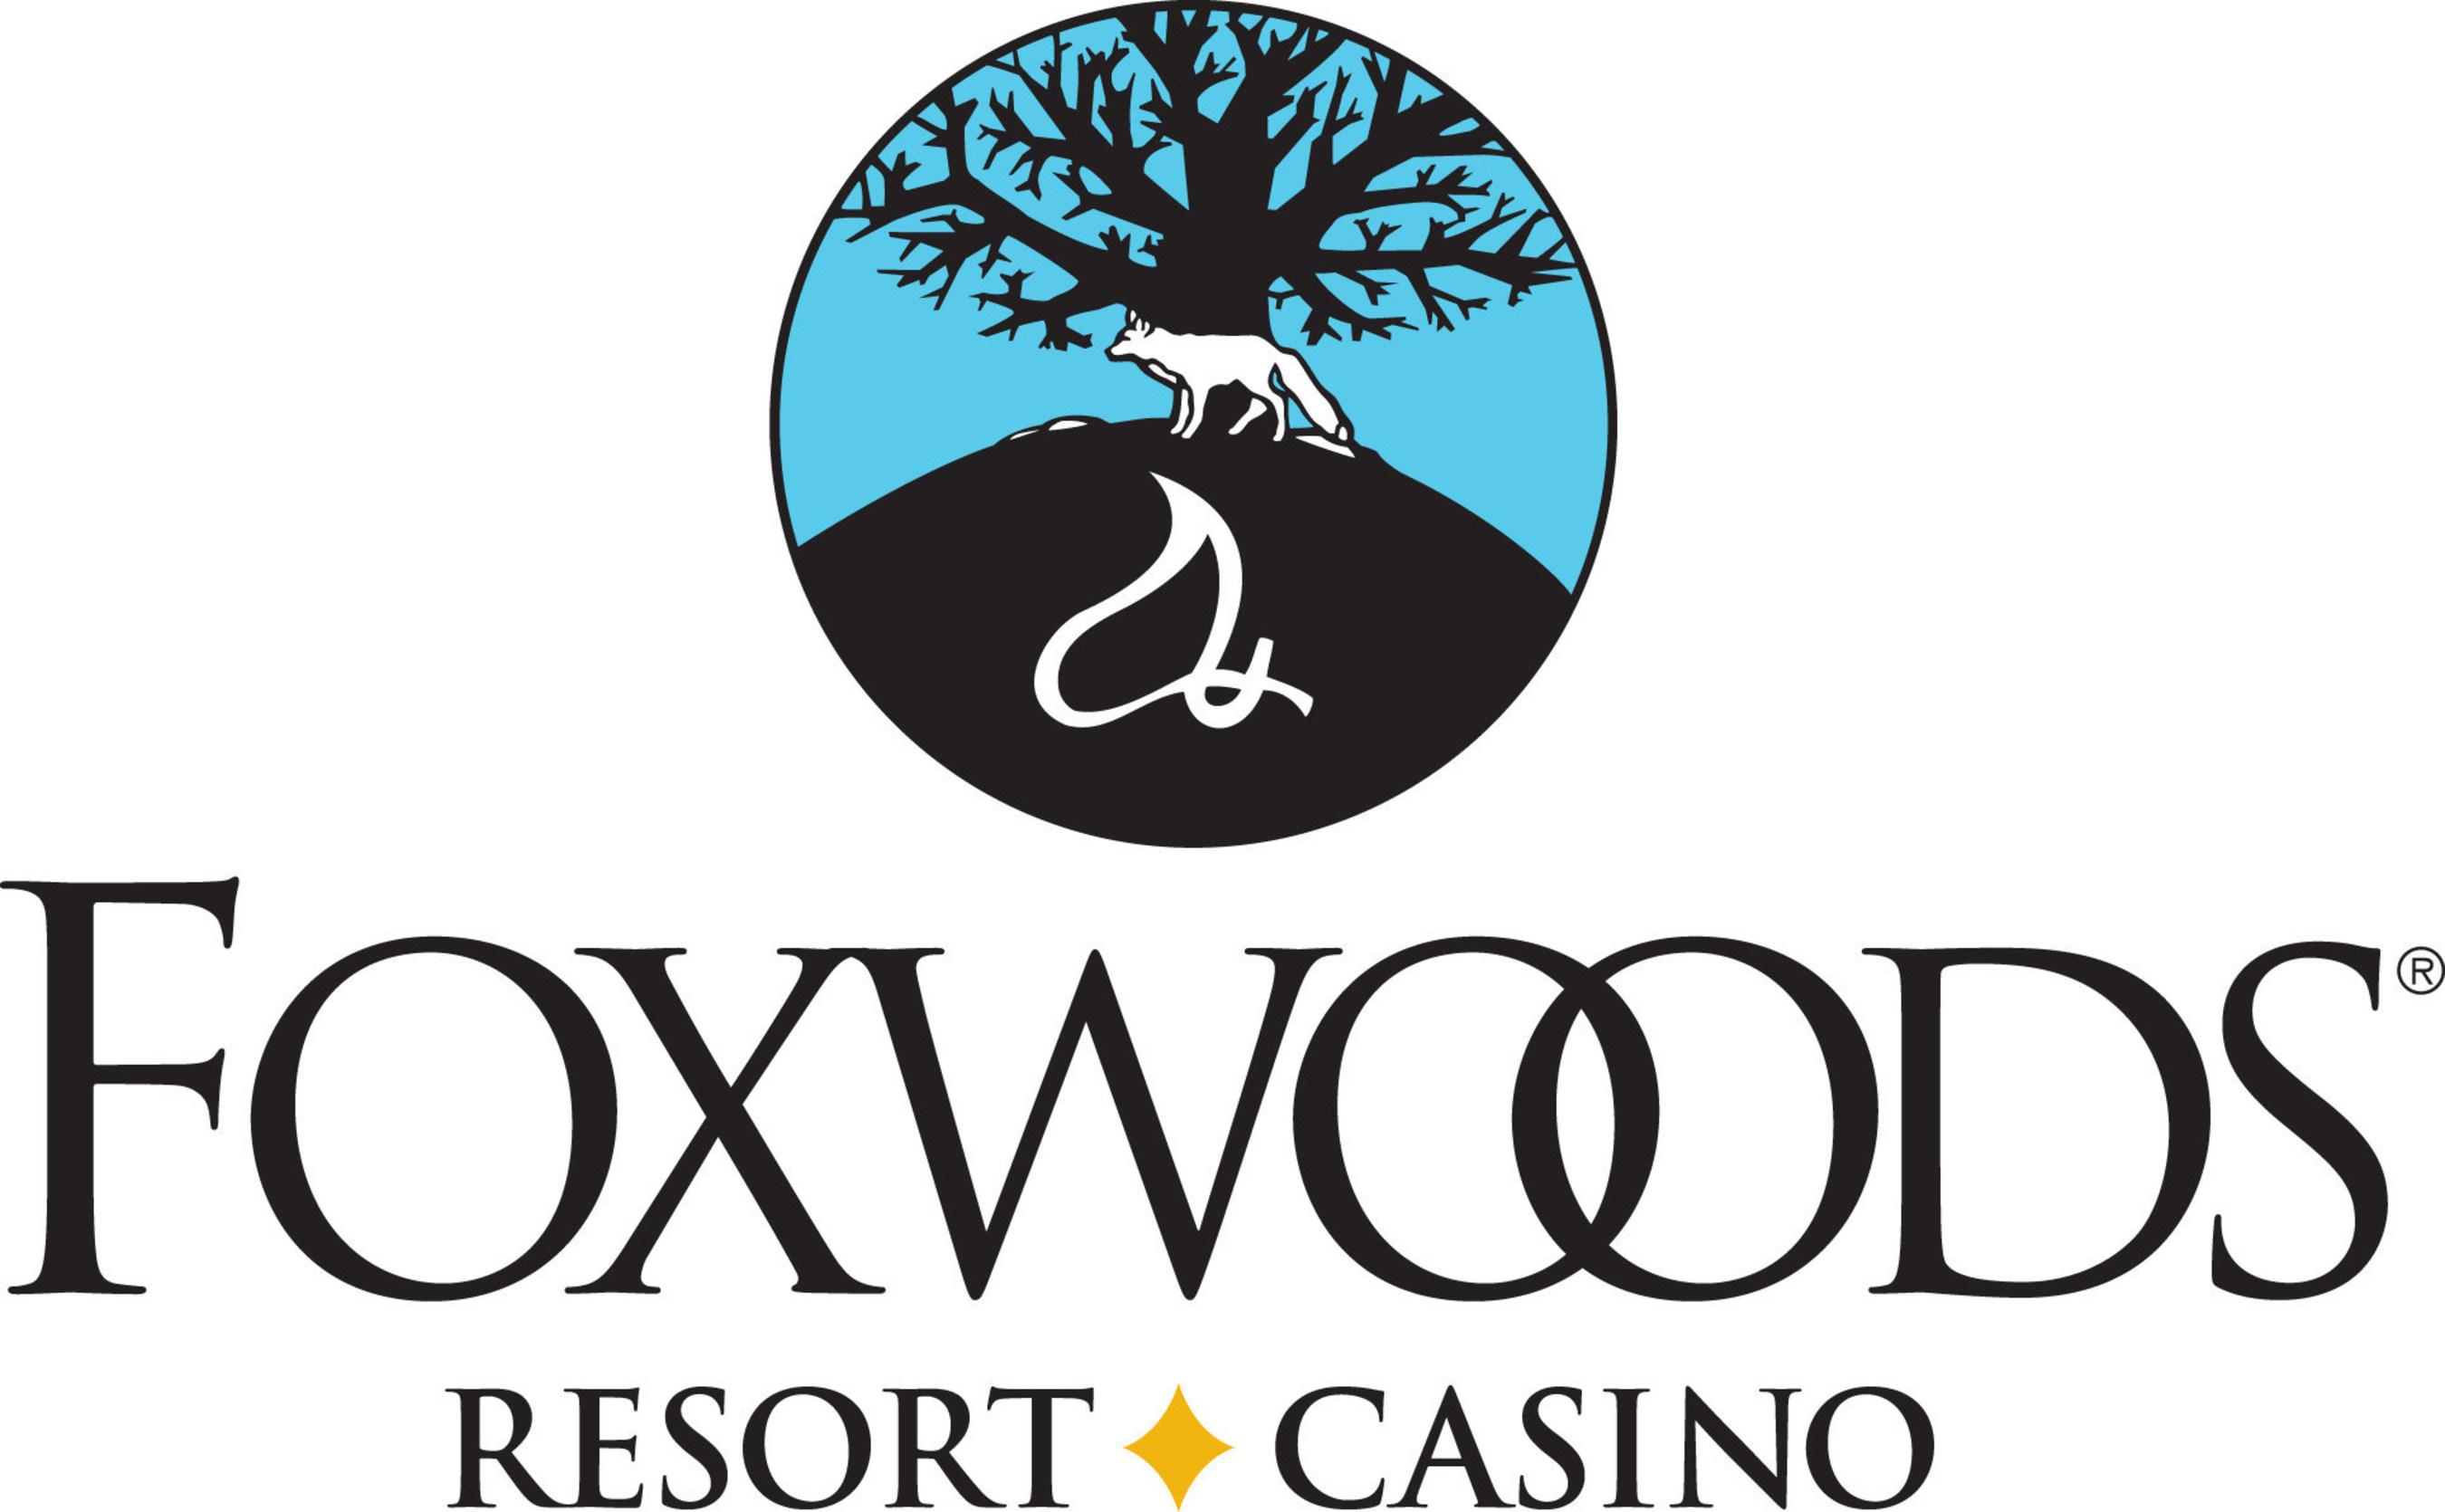 Foxwoods Logo